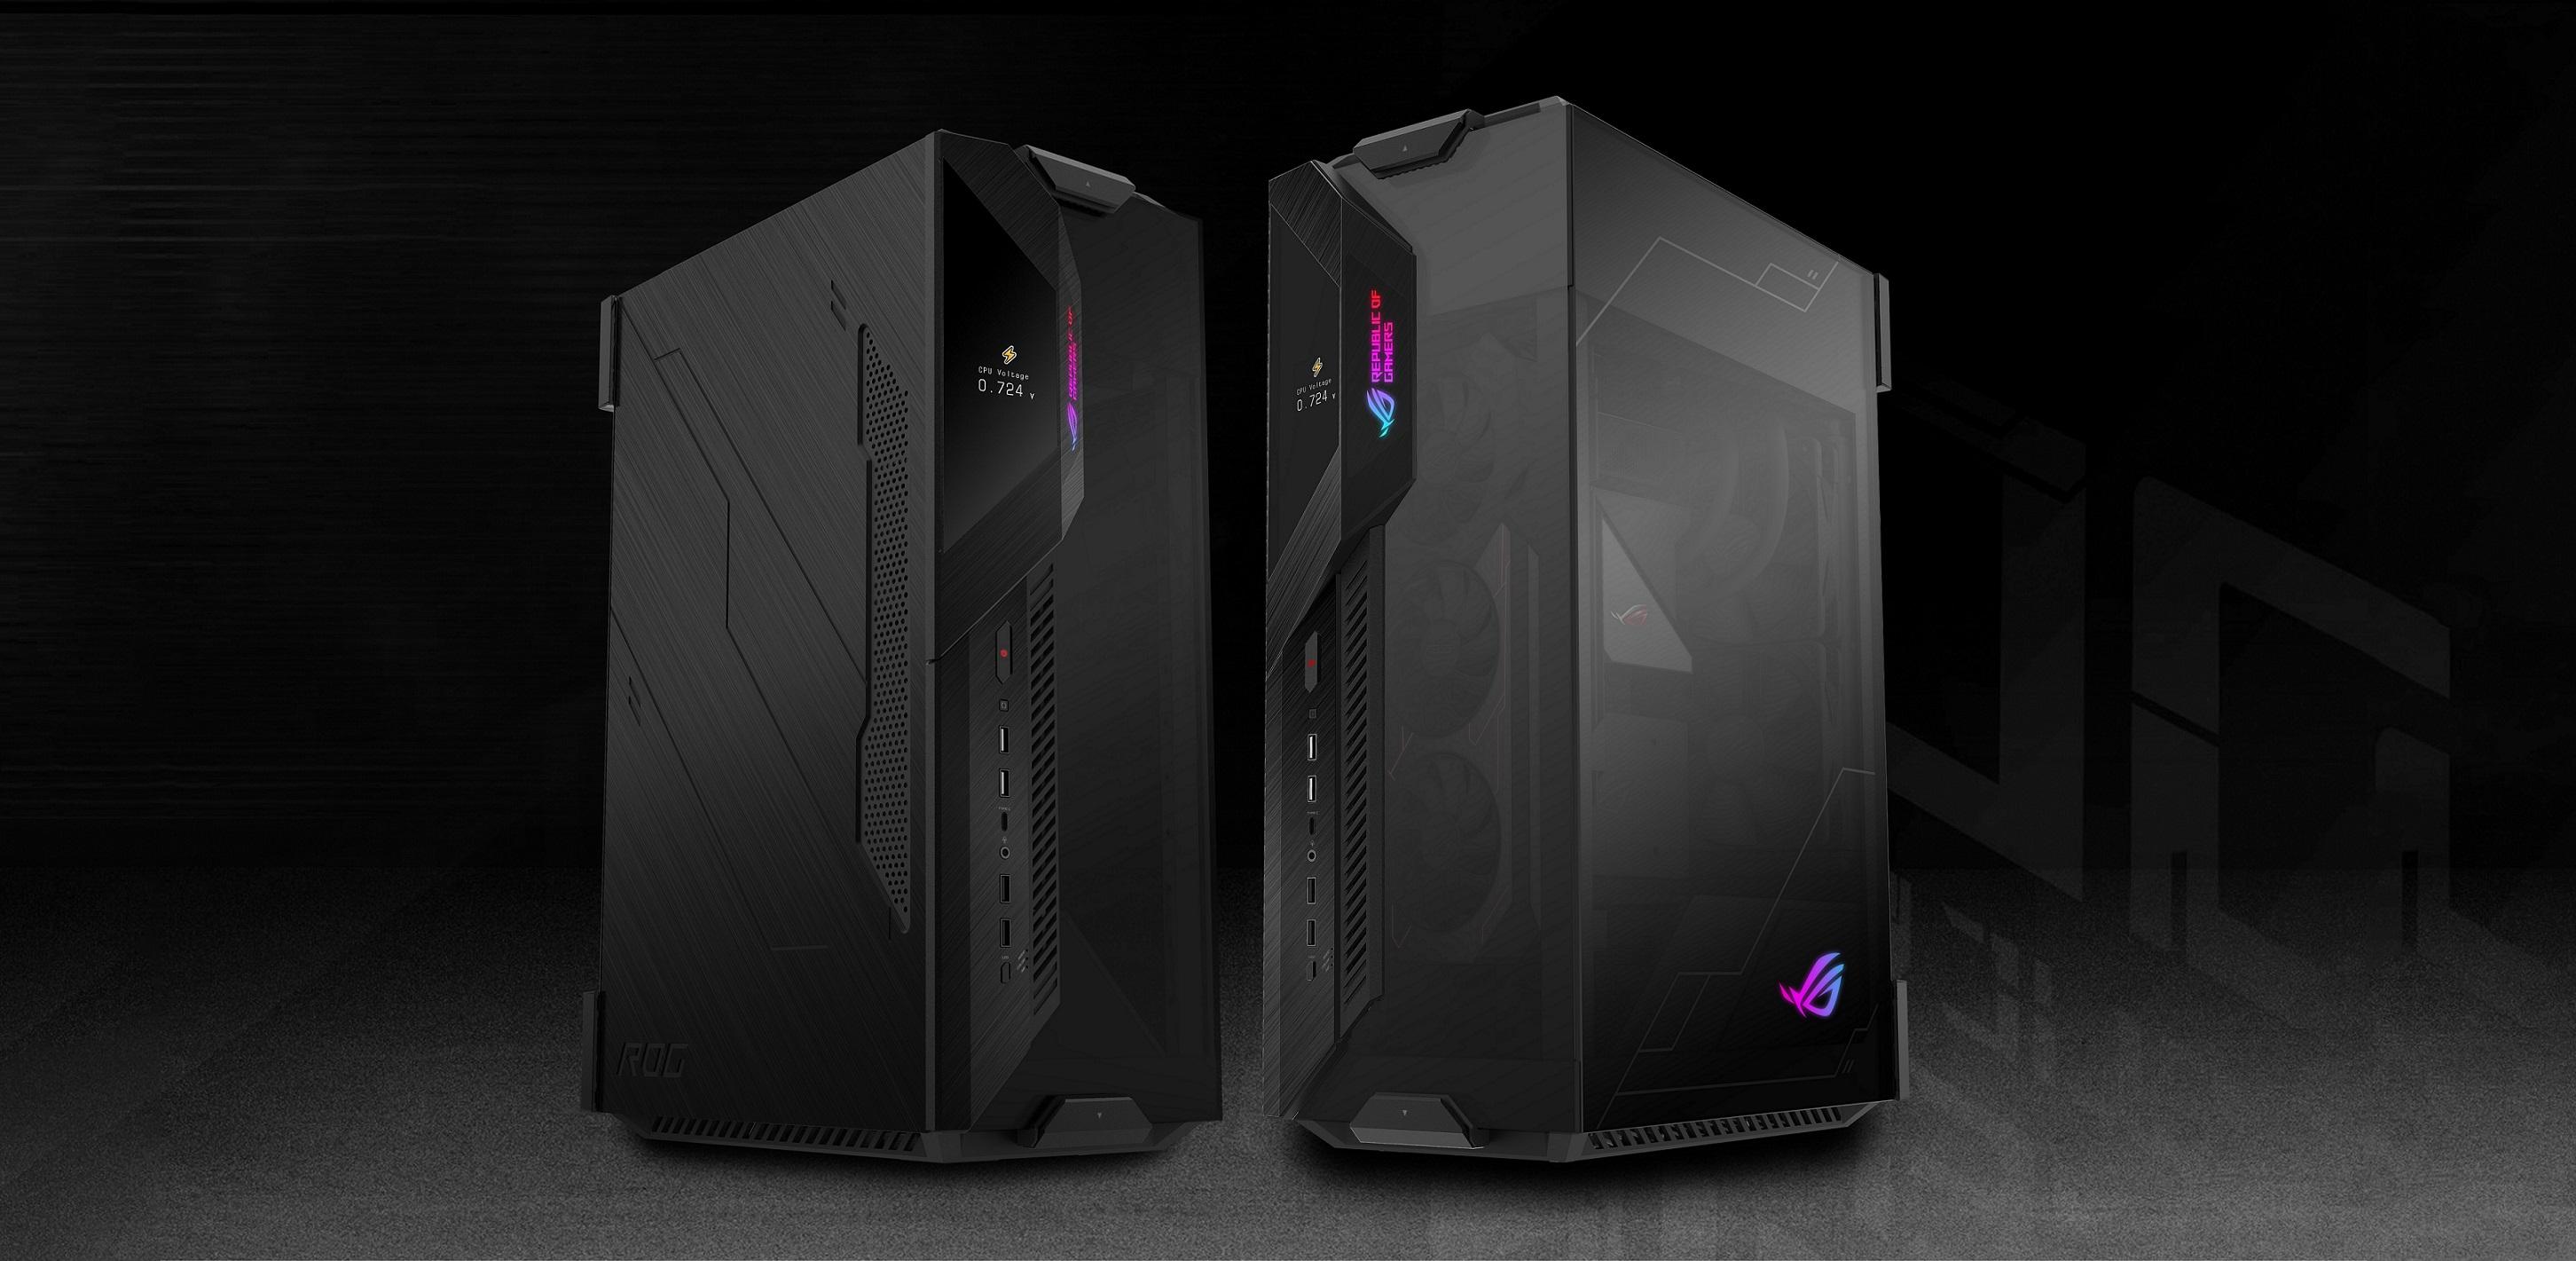 ROG現場將展示將於現場展出多項話題產品,讓玩家們搶先用最新重裝精銳體驗遊戲。